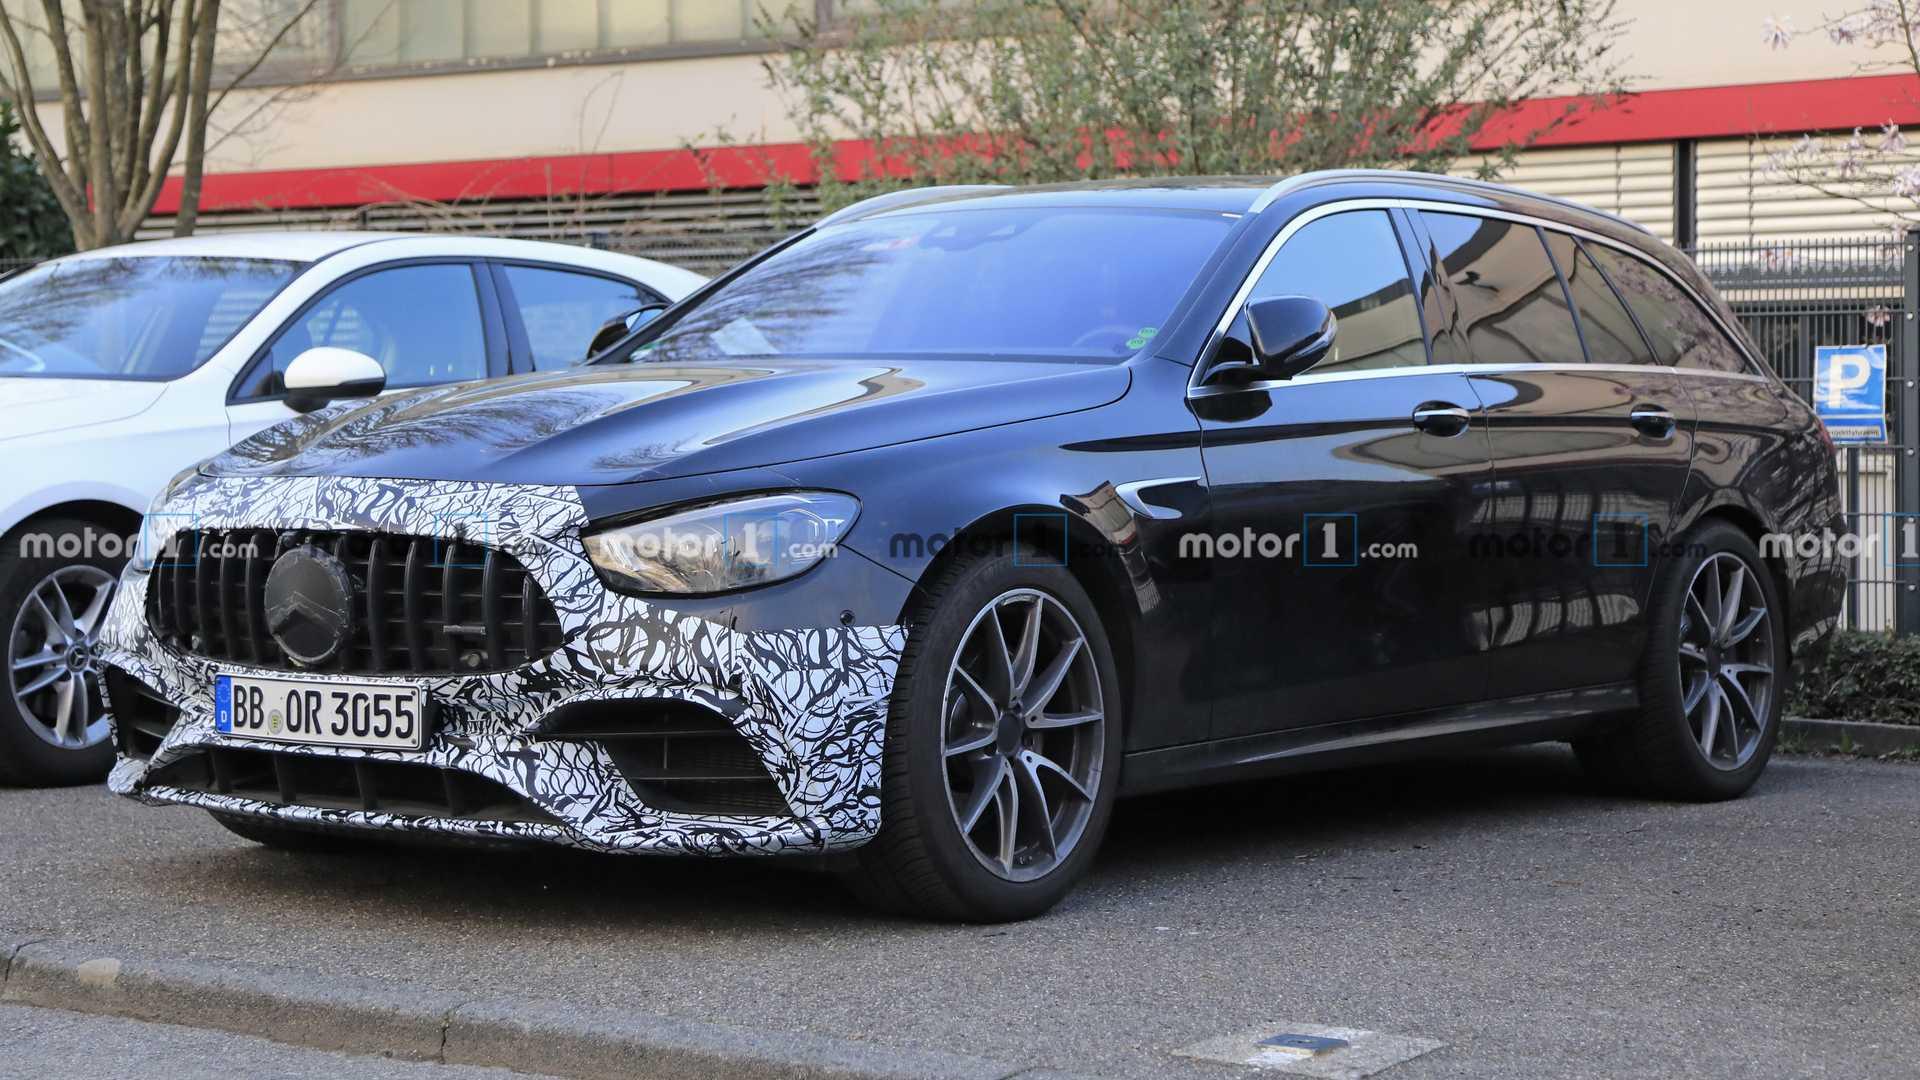 Mercedes-AMG E 63 Wagon 2021 foto spia